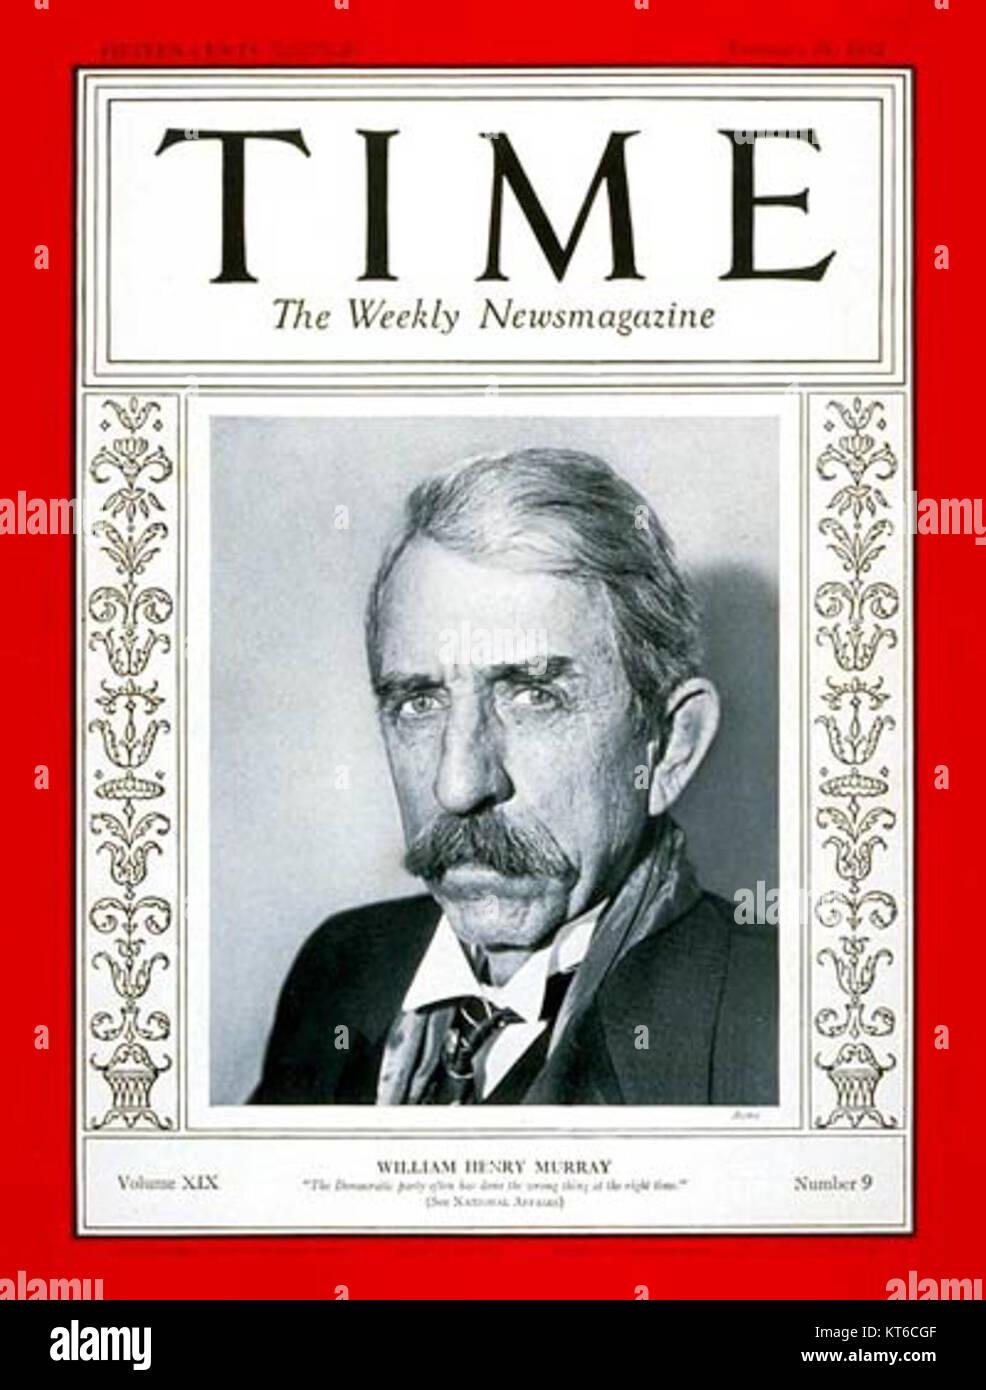 William H. Murray Time Magazine - Stock Image